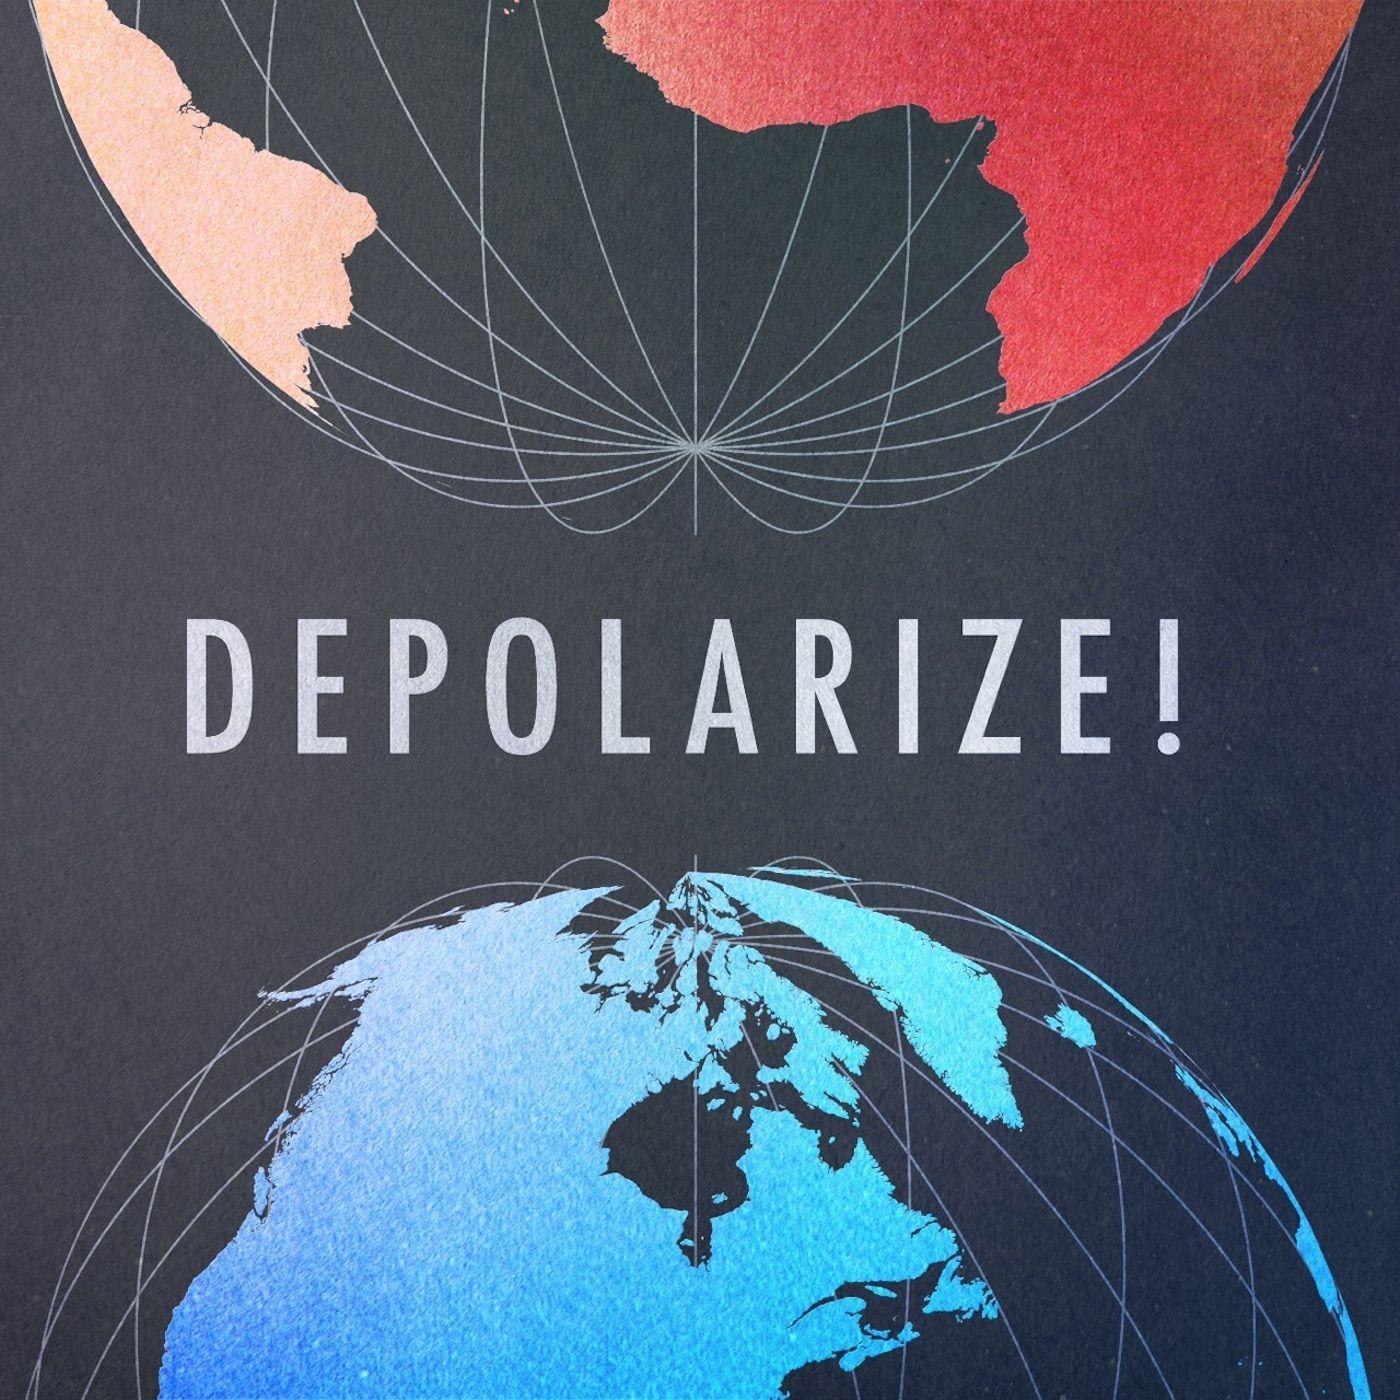 Depolarize! Podcast